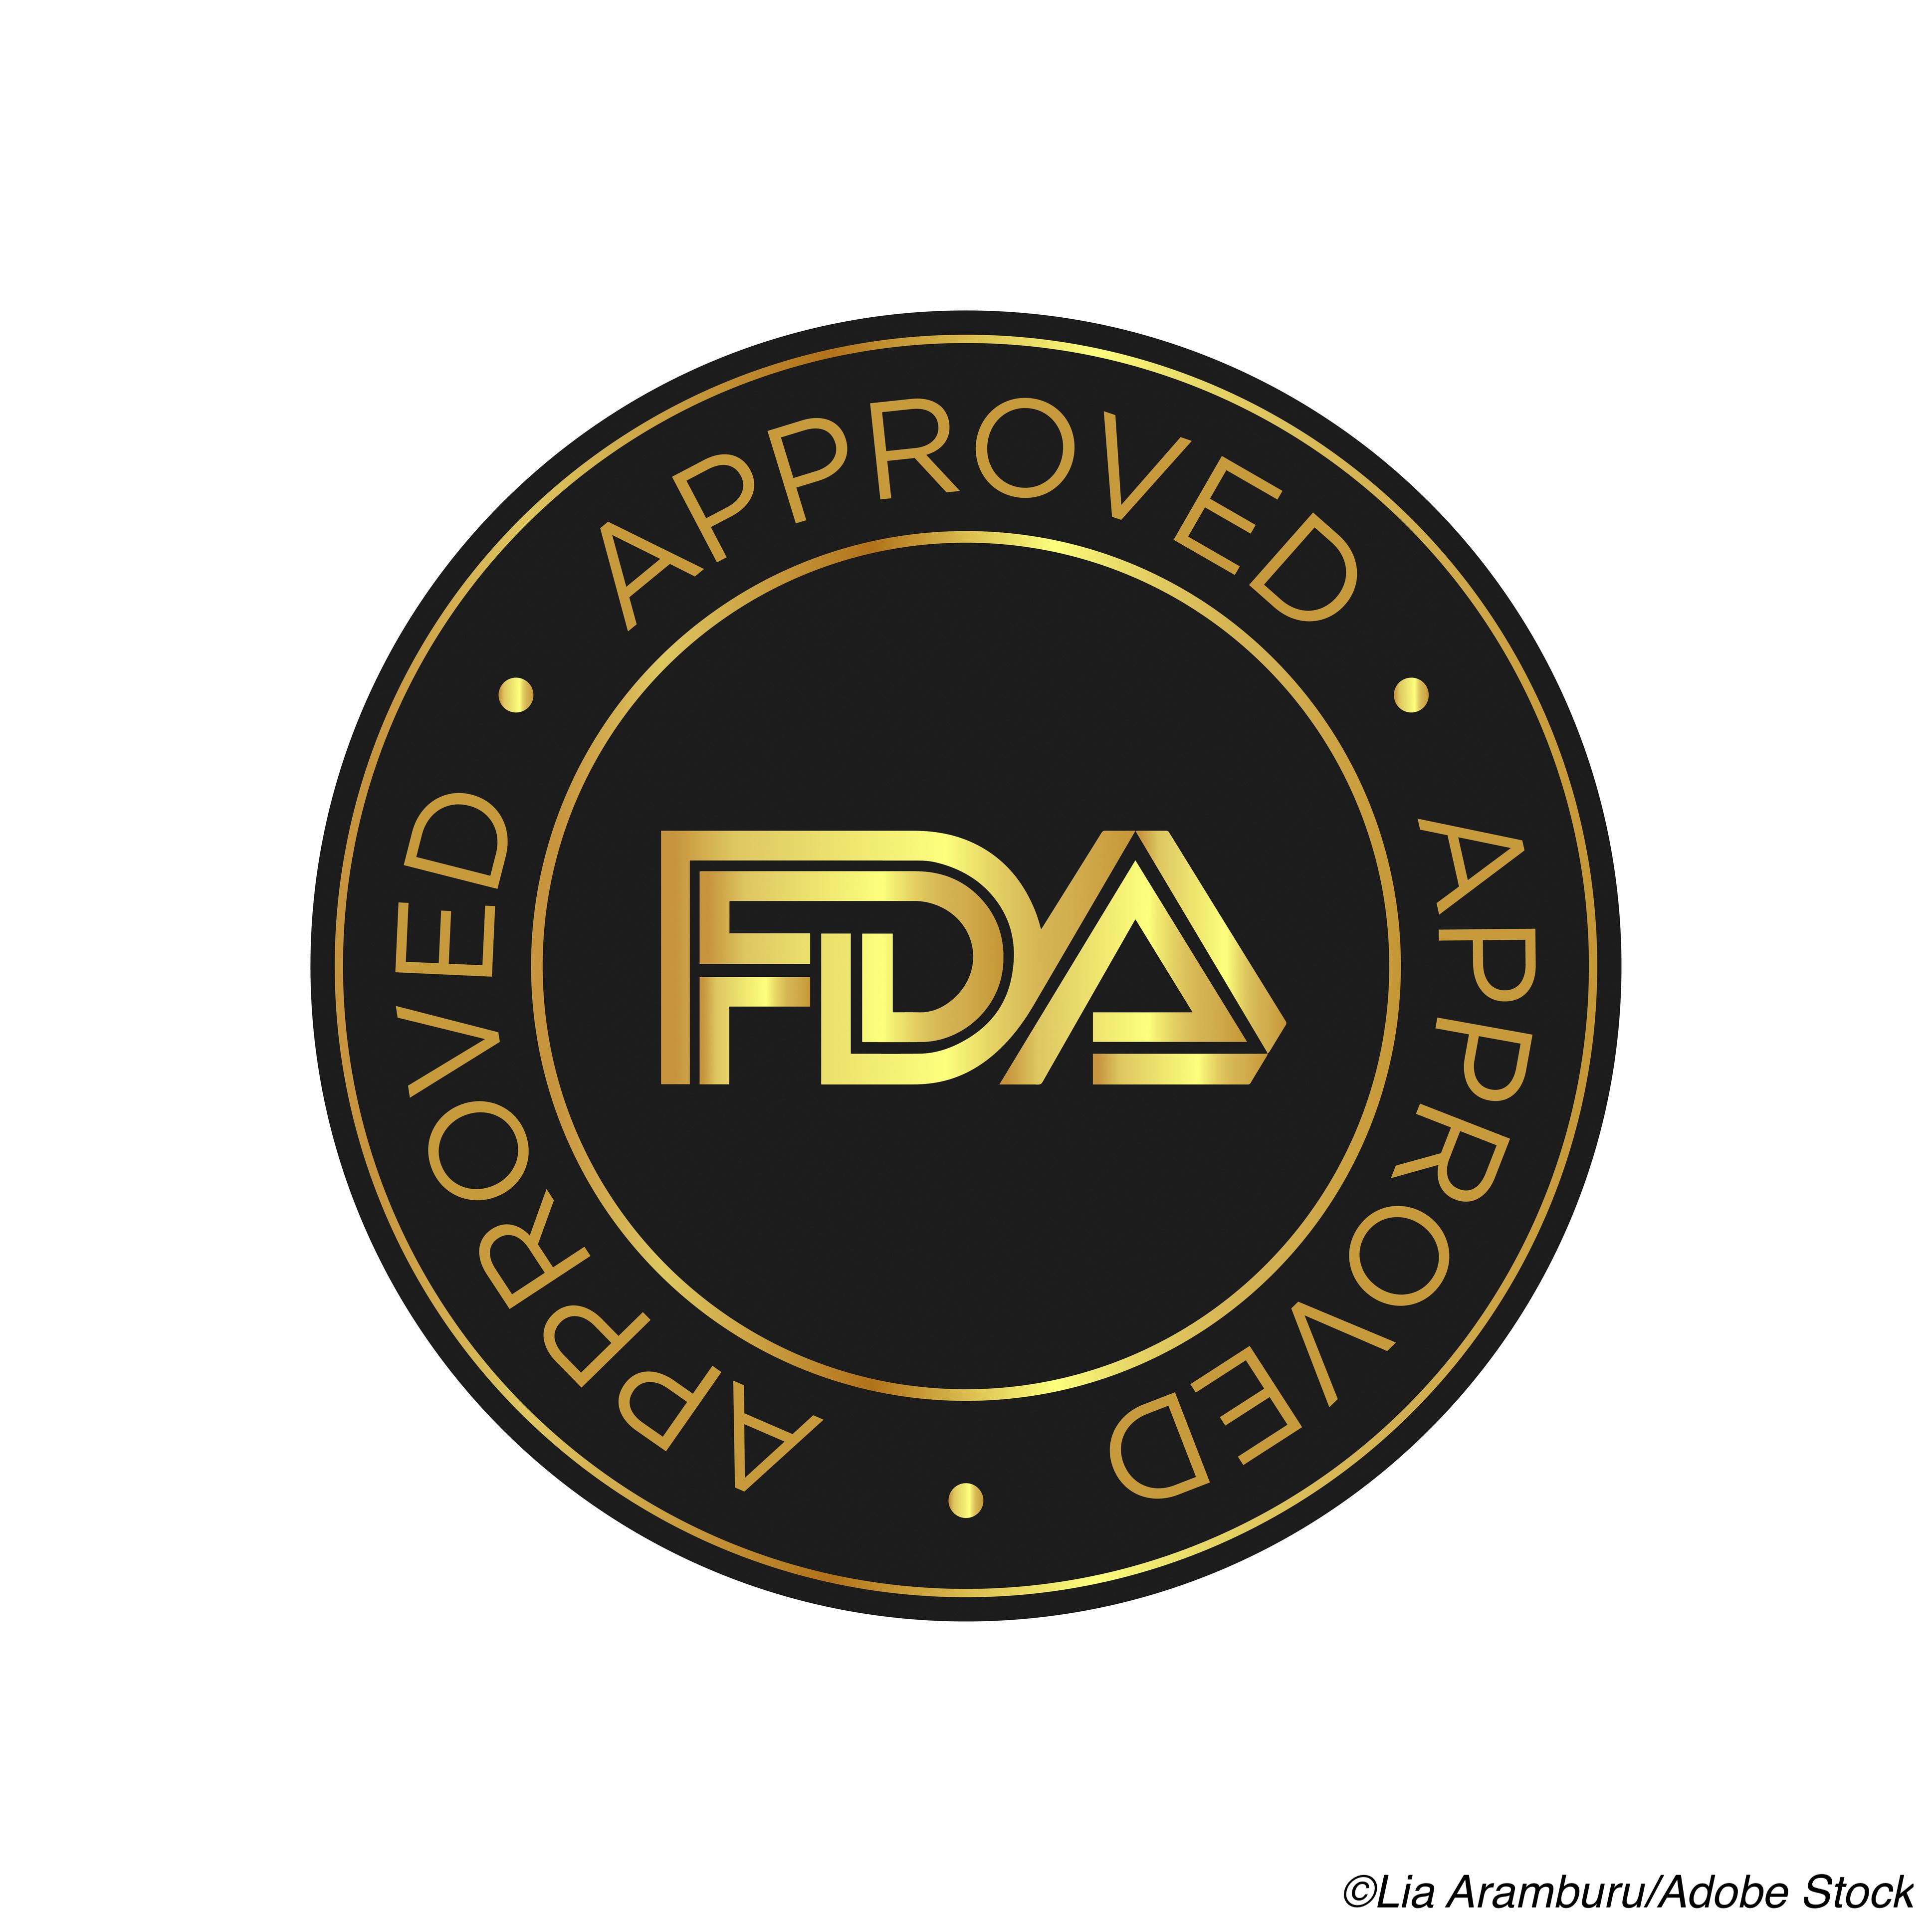 Dapagliflozin Gets FDA Nod For Treatment of CKD